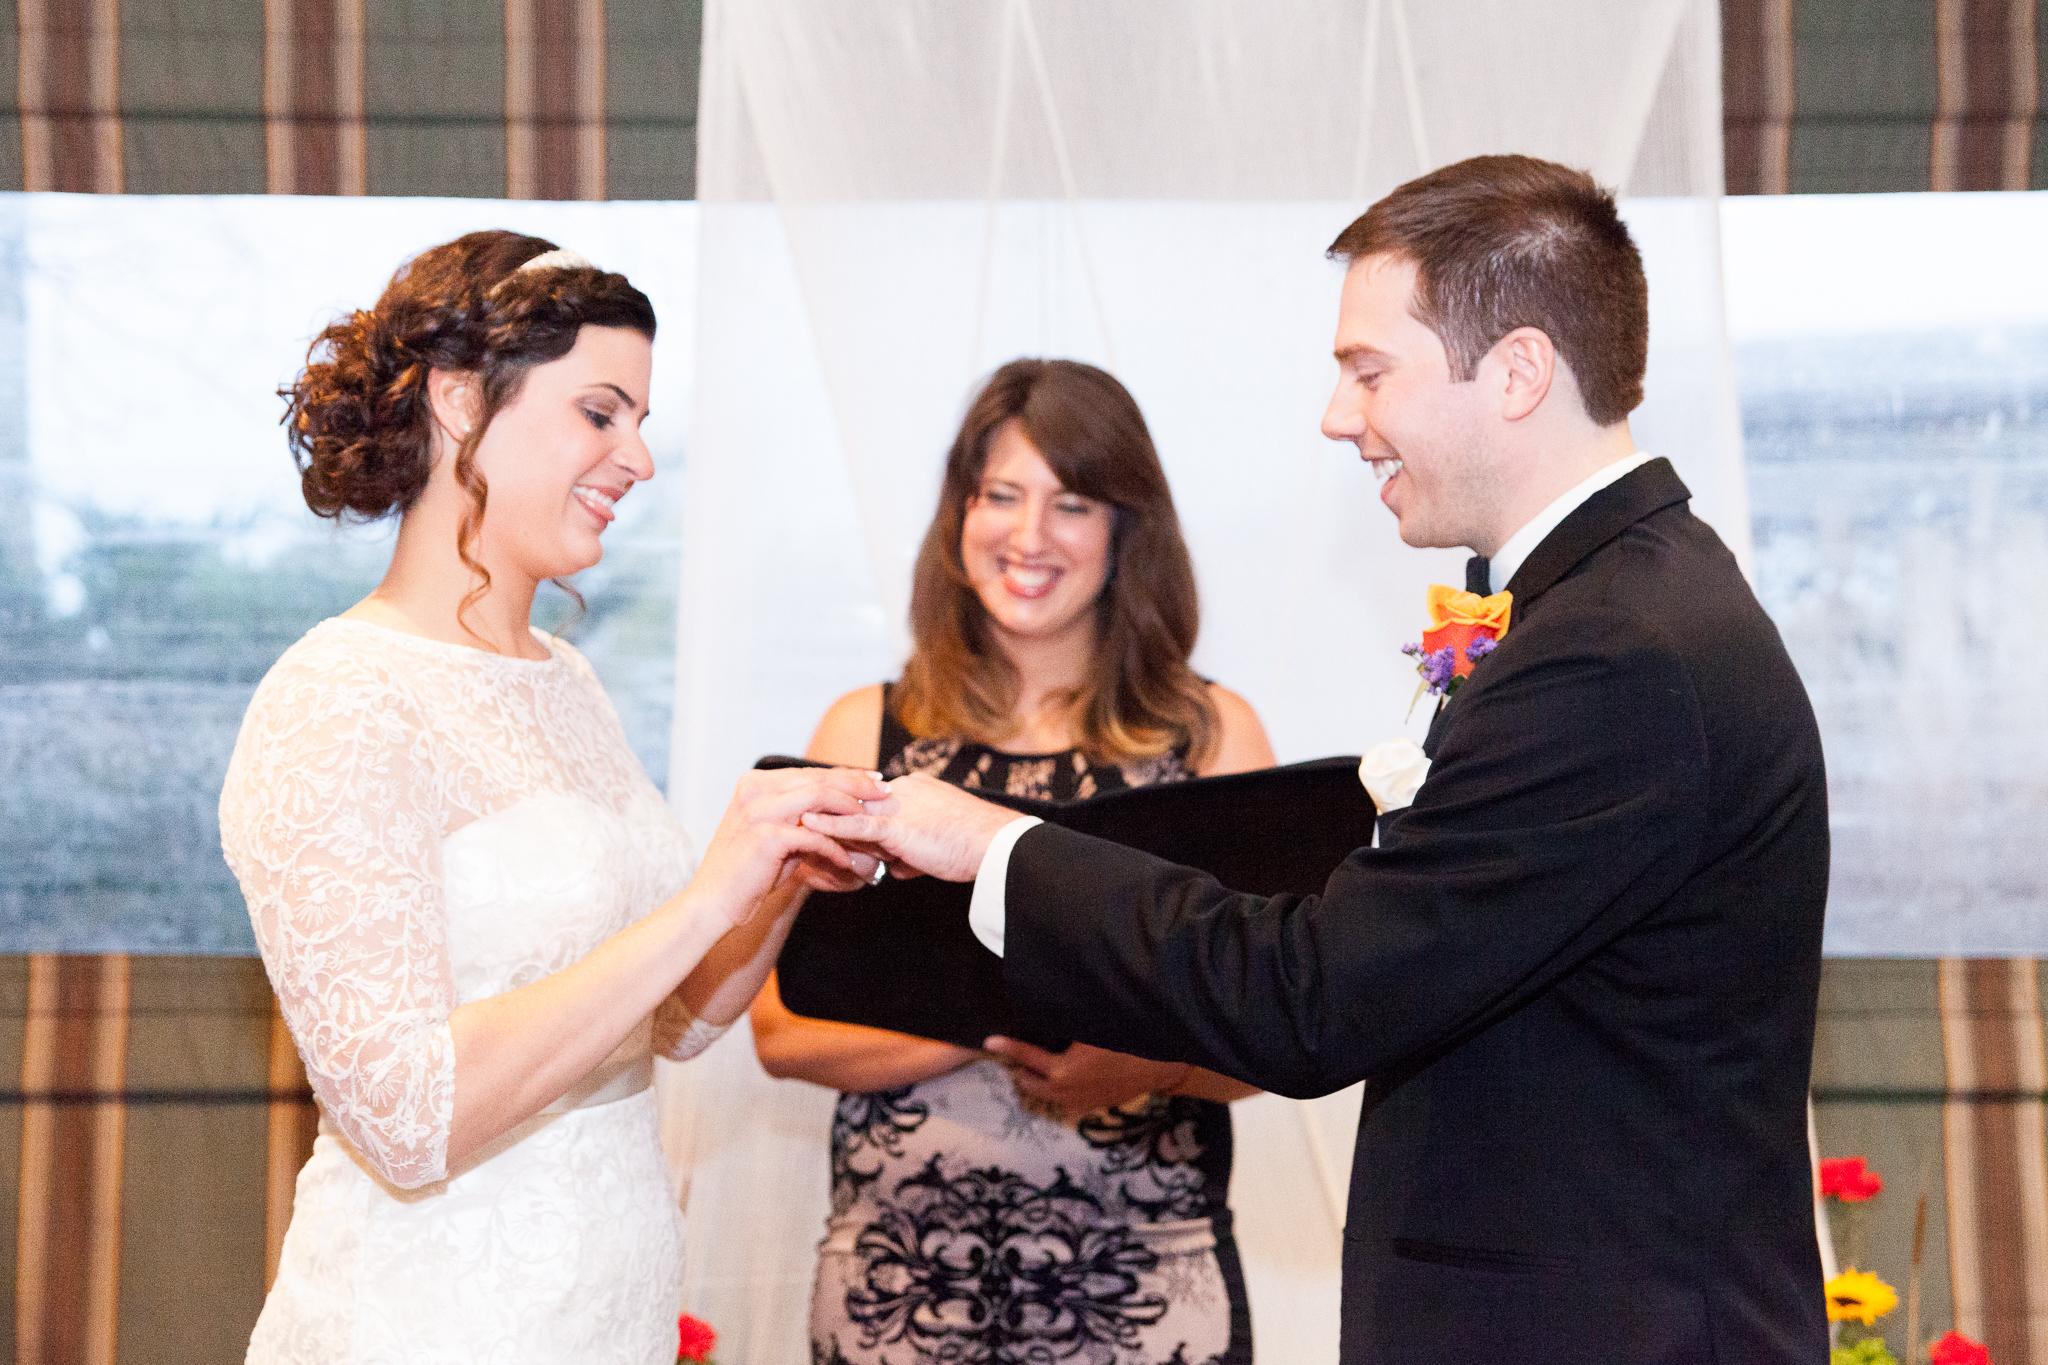 camuglia-whomstudio-chelsea_and_andy-nycphotographer-wedding-brooklyn-buffalo-timberlodge-085-0628.jpg